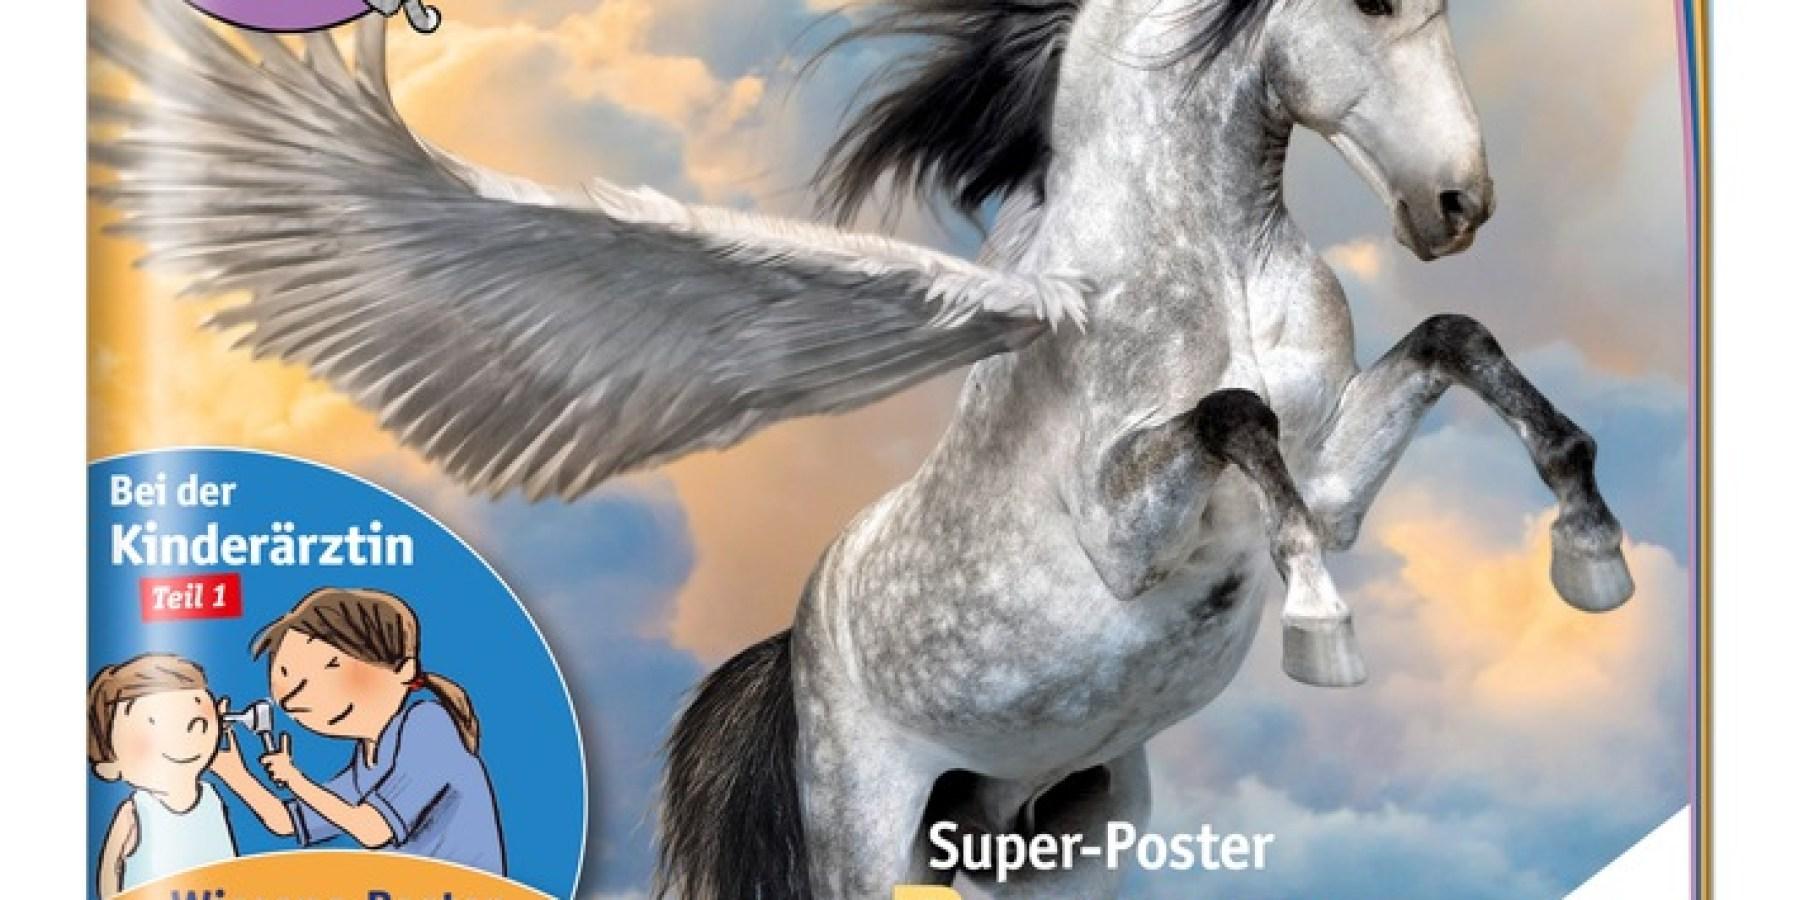 medizini mit Super-Poster Pegasus, dem mystischen Pferd